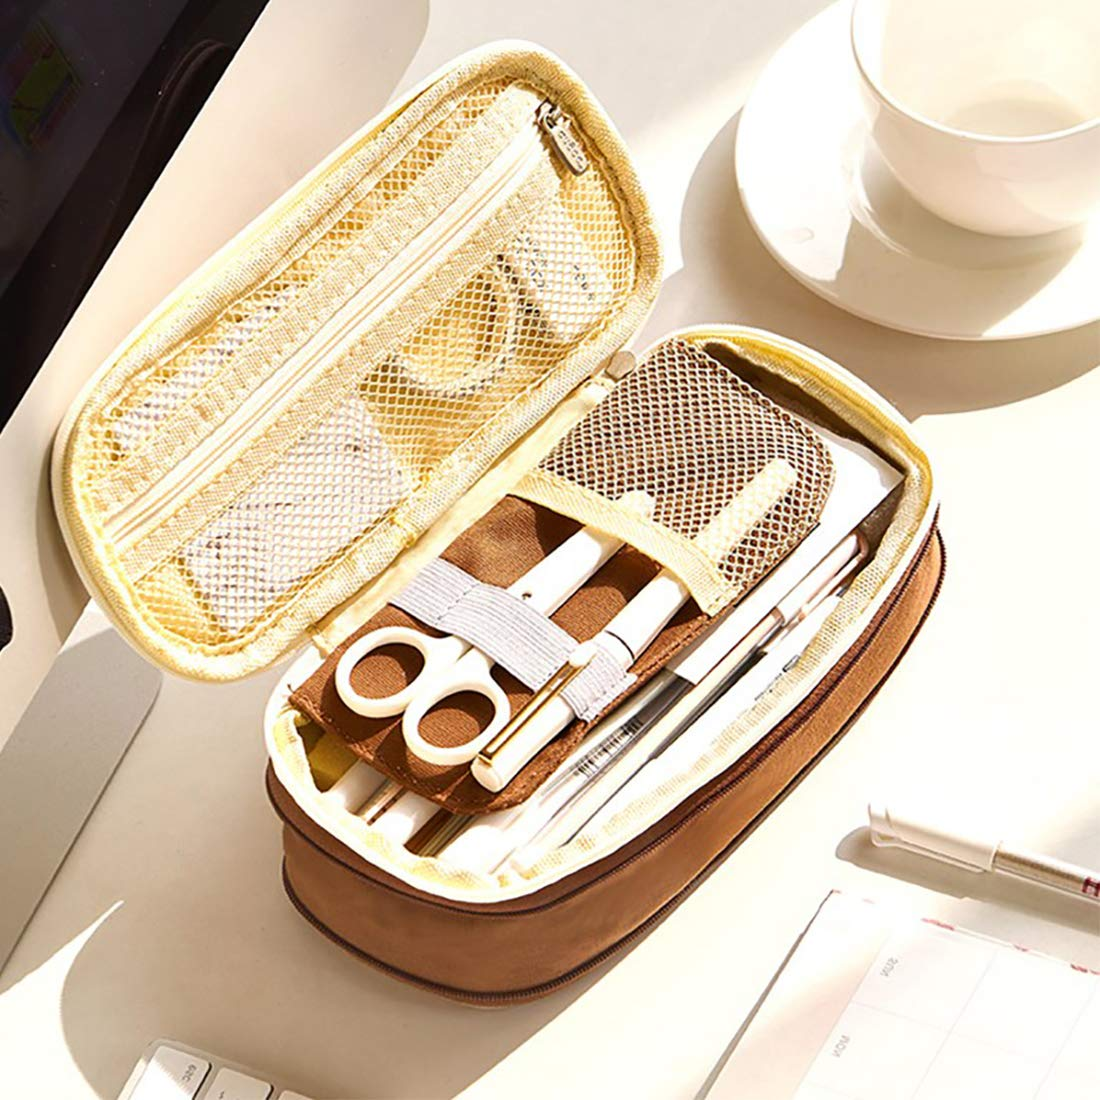 Oyachic Telescopic Pencil Case Large Capacity Zipper Pen Bag Canvas Makeup Stationery Box Office School Supplies Pouch (Dark Brown)